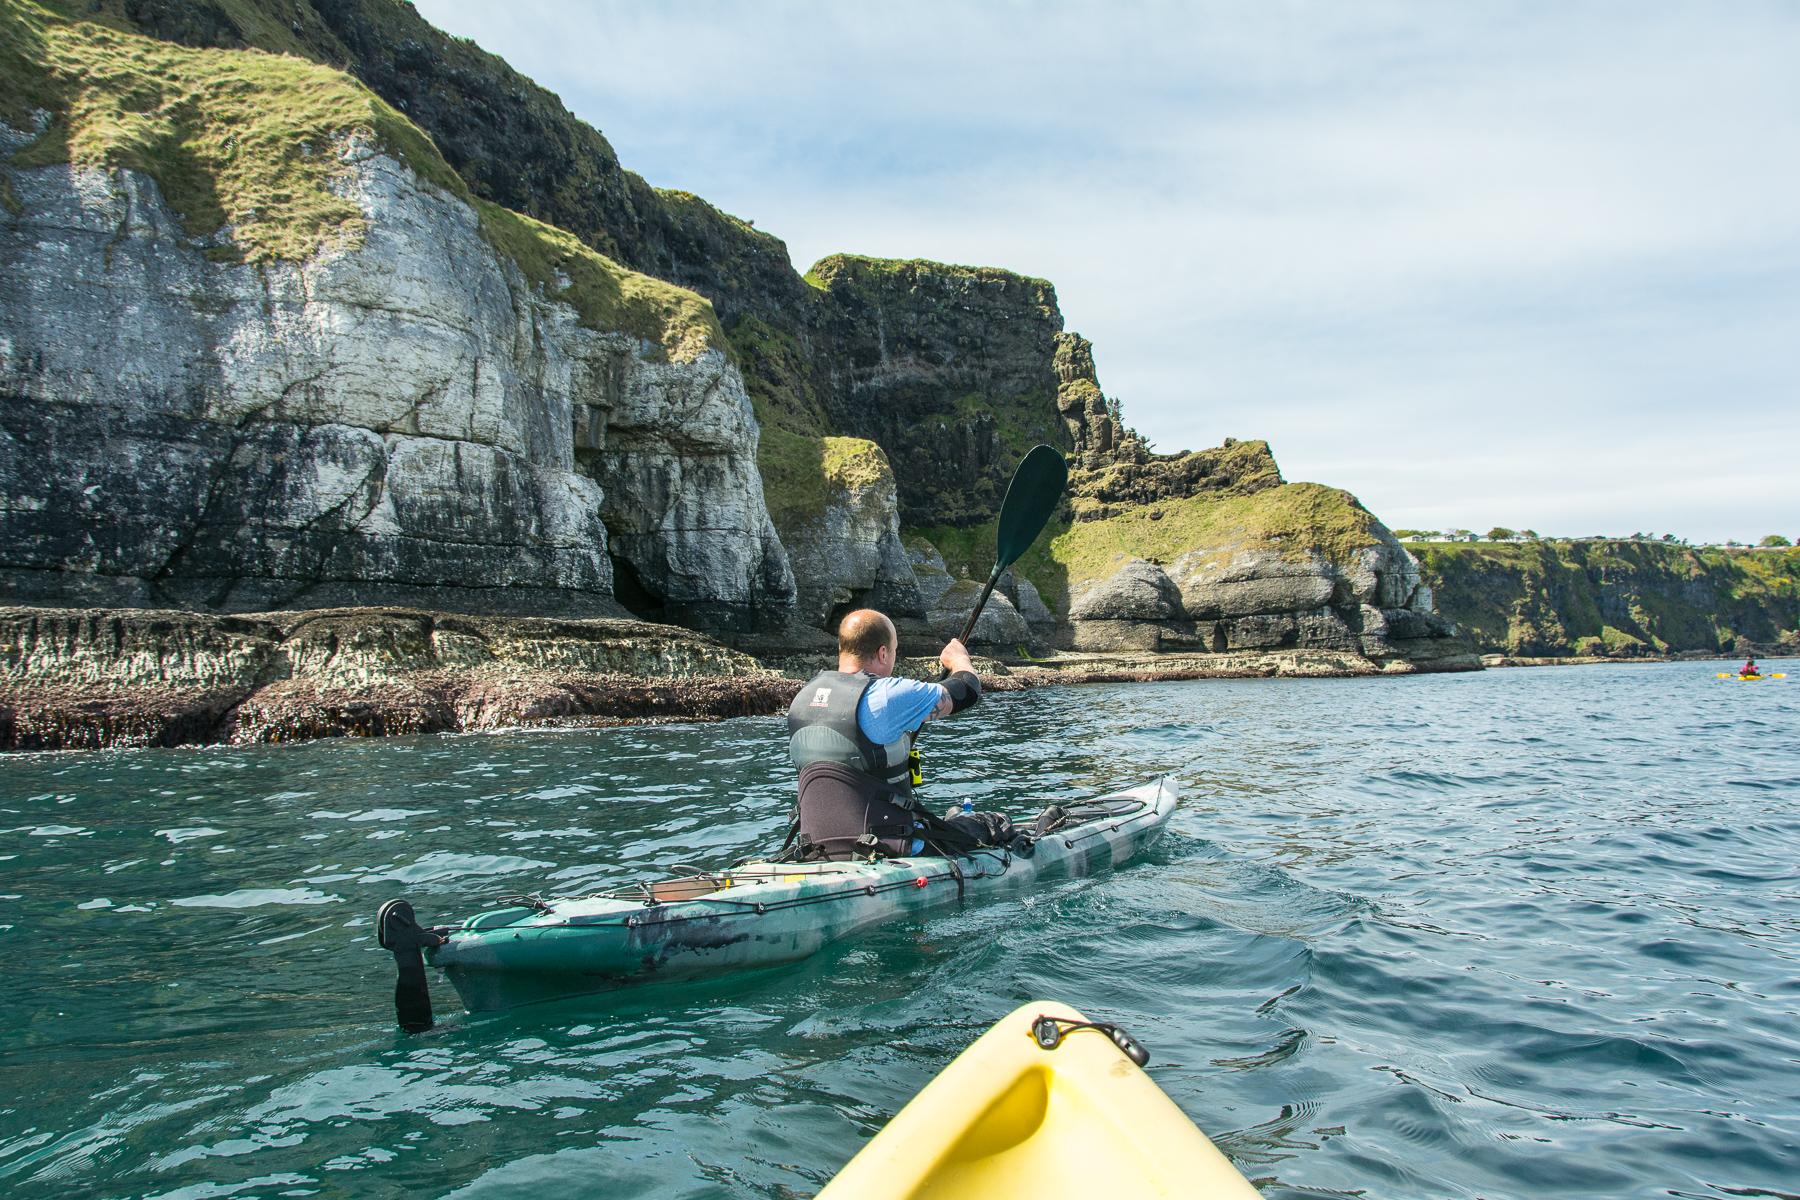 Kayak Tours Northern Ireland by Bout Yeh photographers - photo 7795